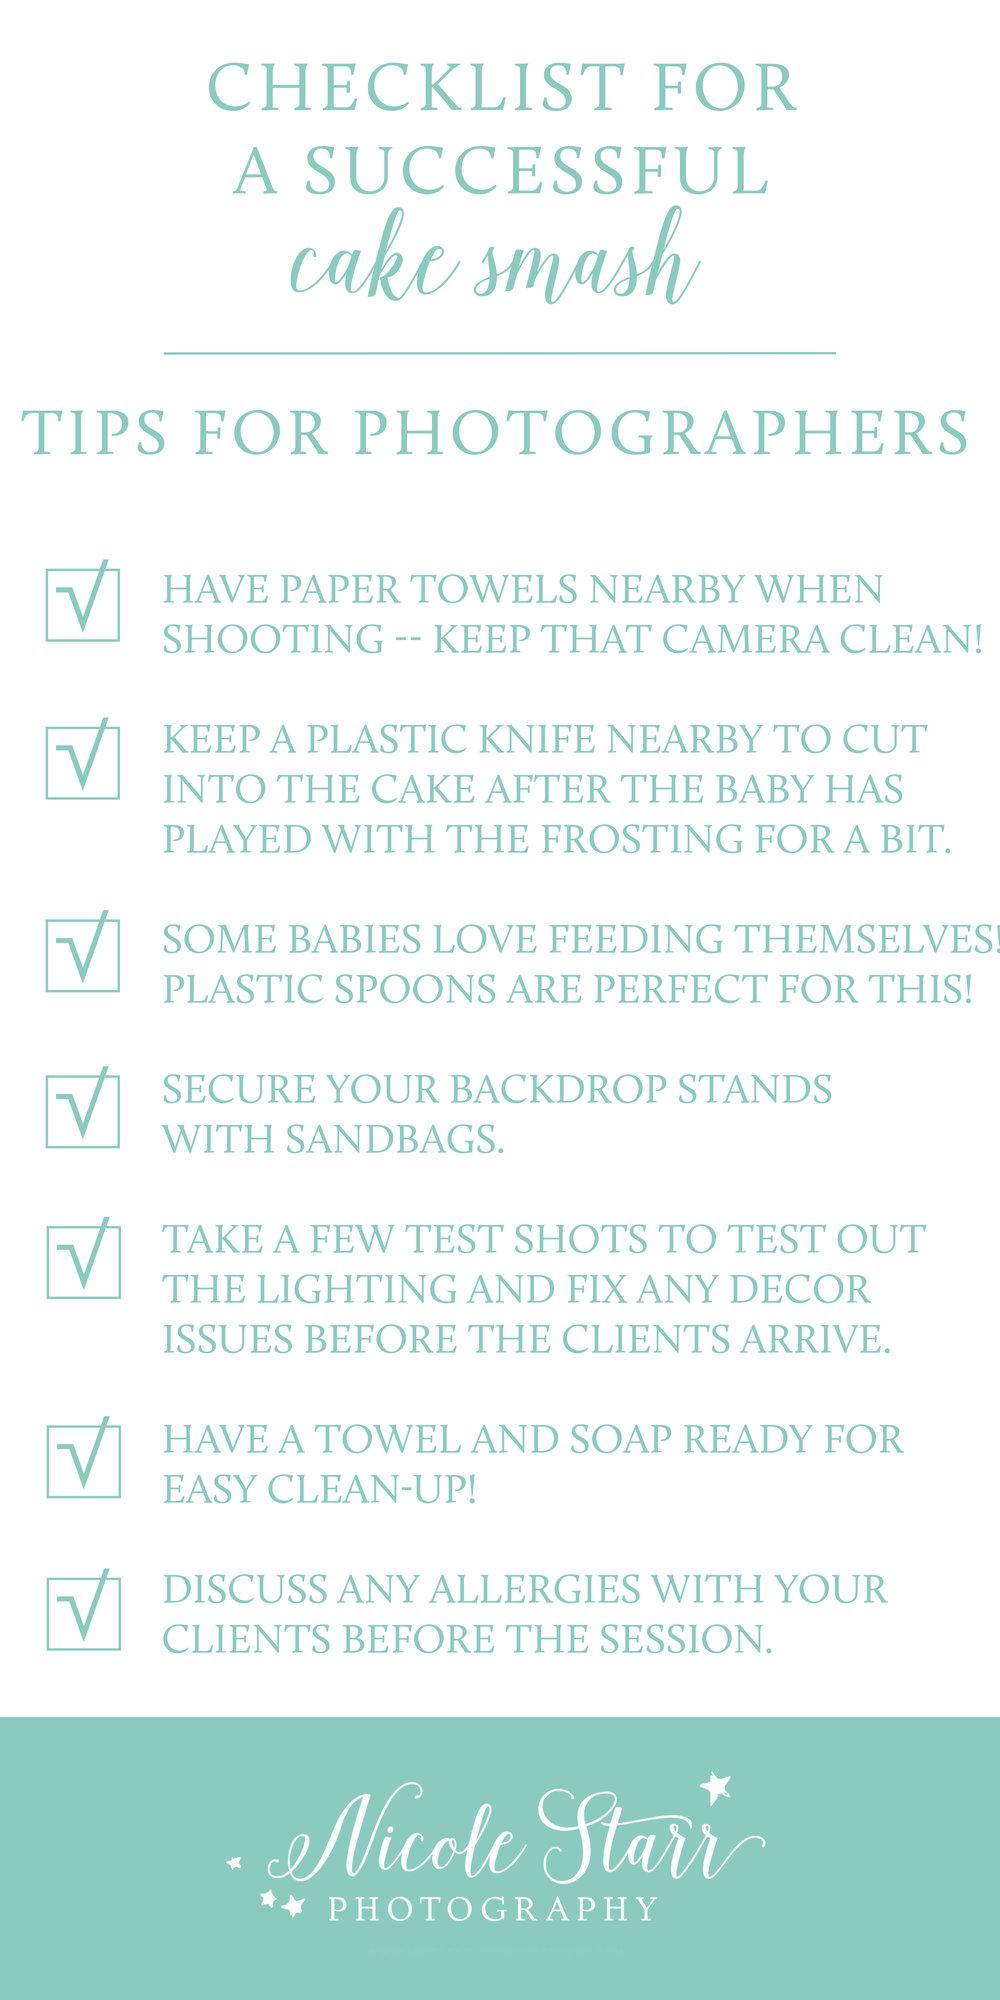 checklist for photographers to prepare for a cake smash photo shoot